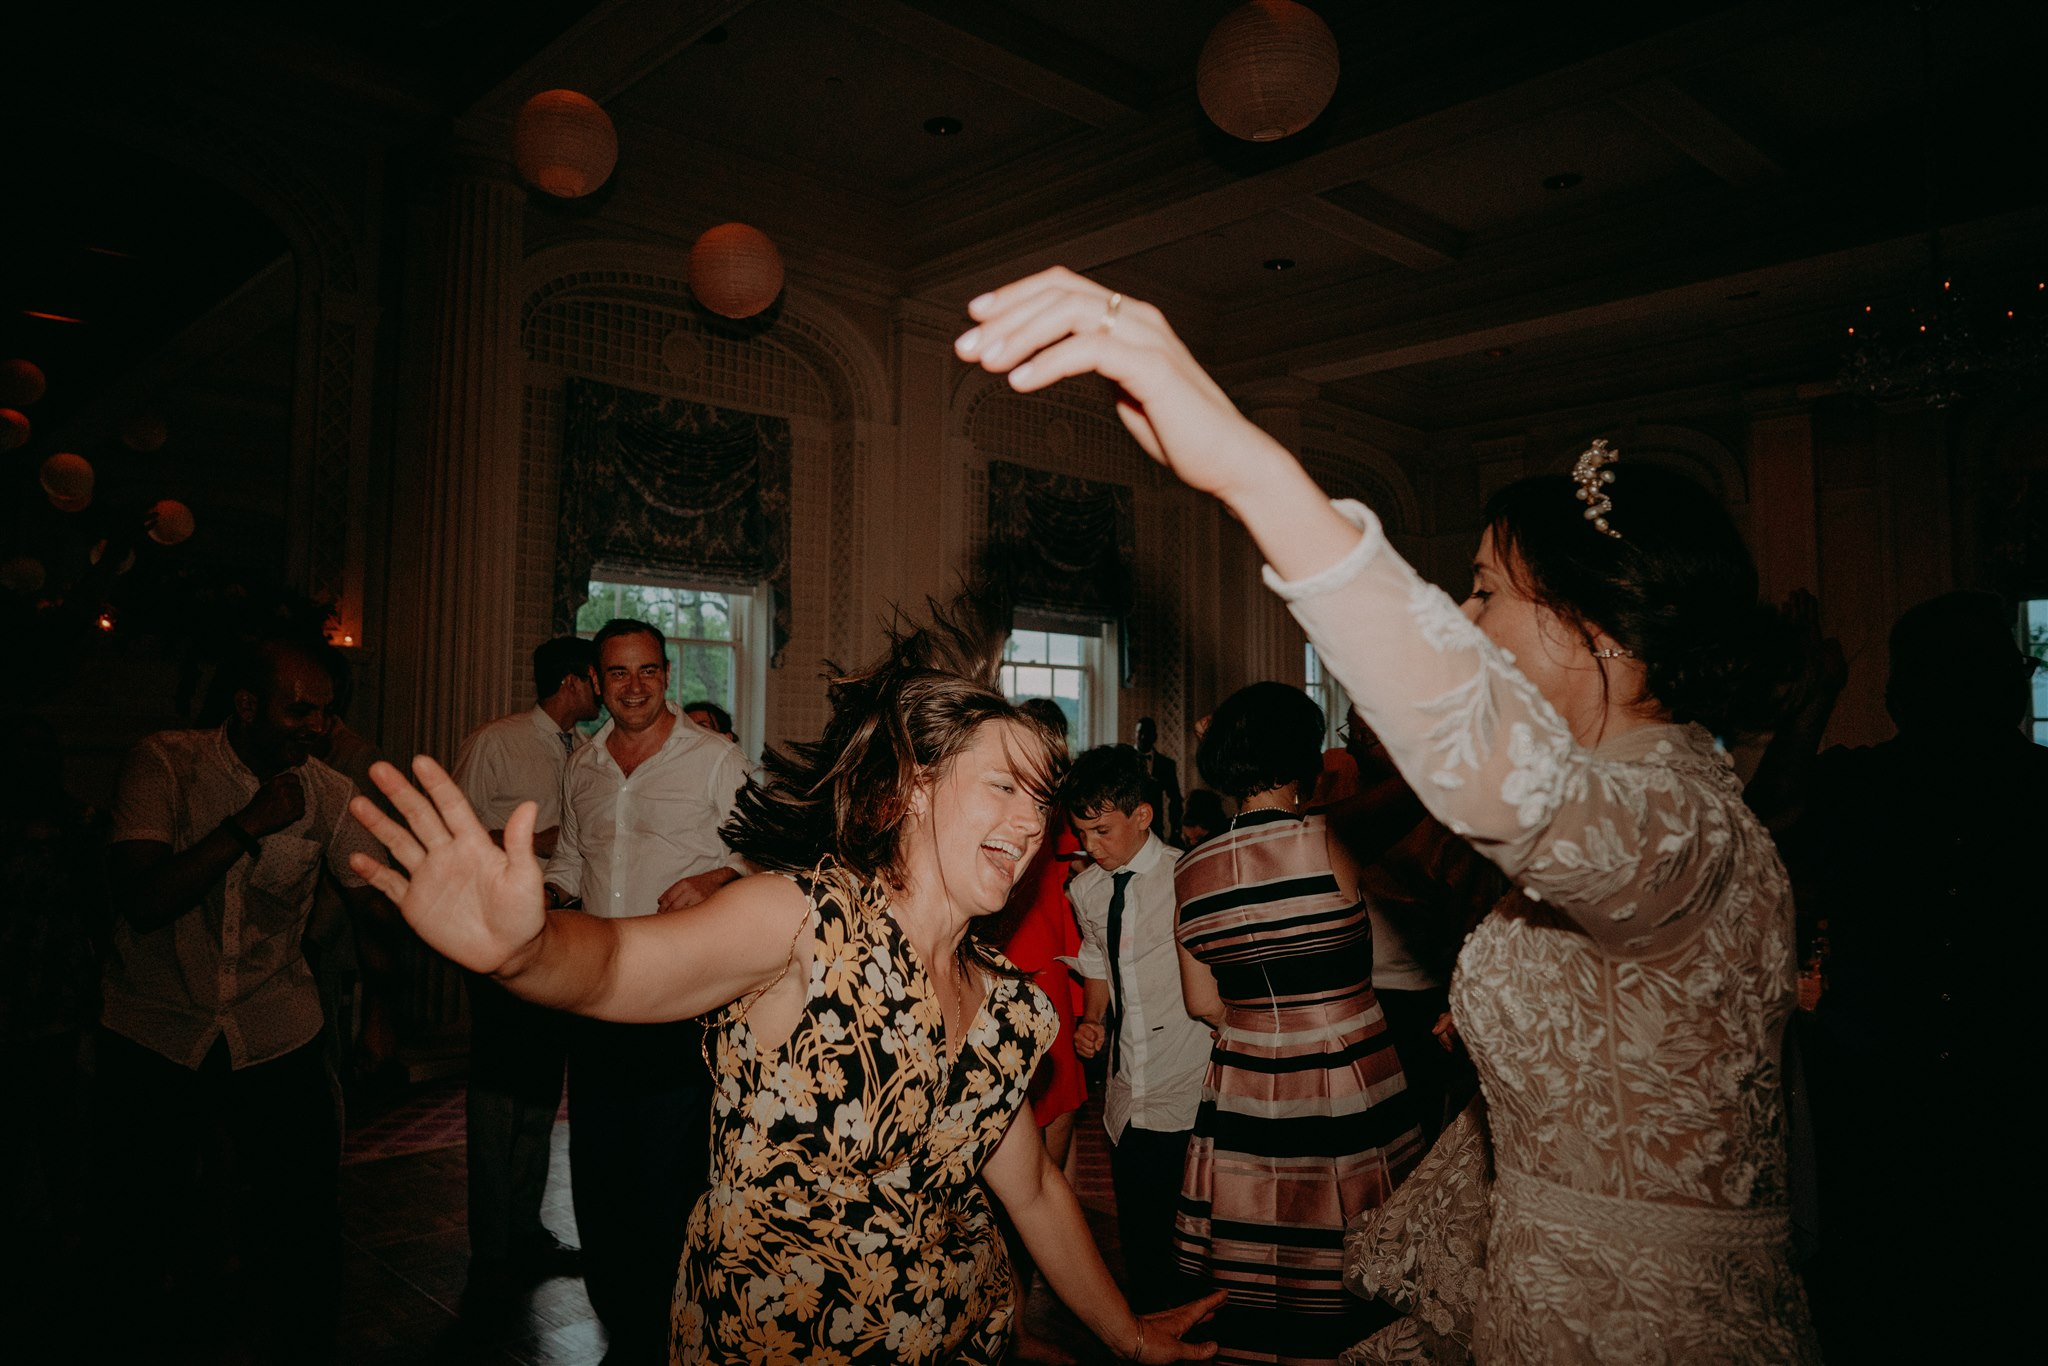 Chellise_Michael_Photography_Hudson_Valley_Wedding_Photographer_Otesaga_Hotel-6114.jpg